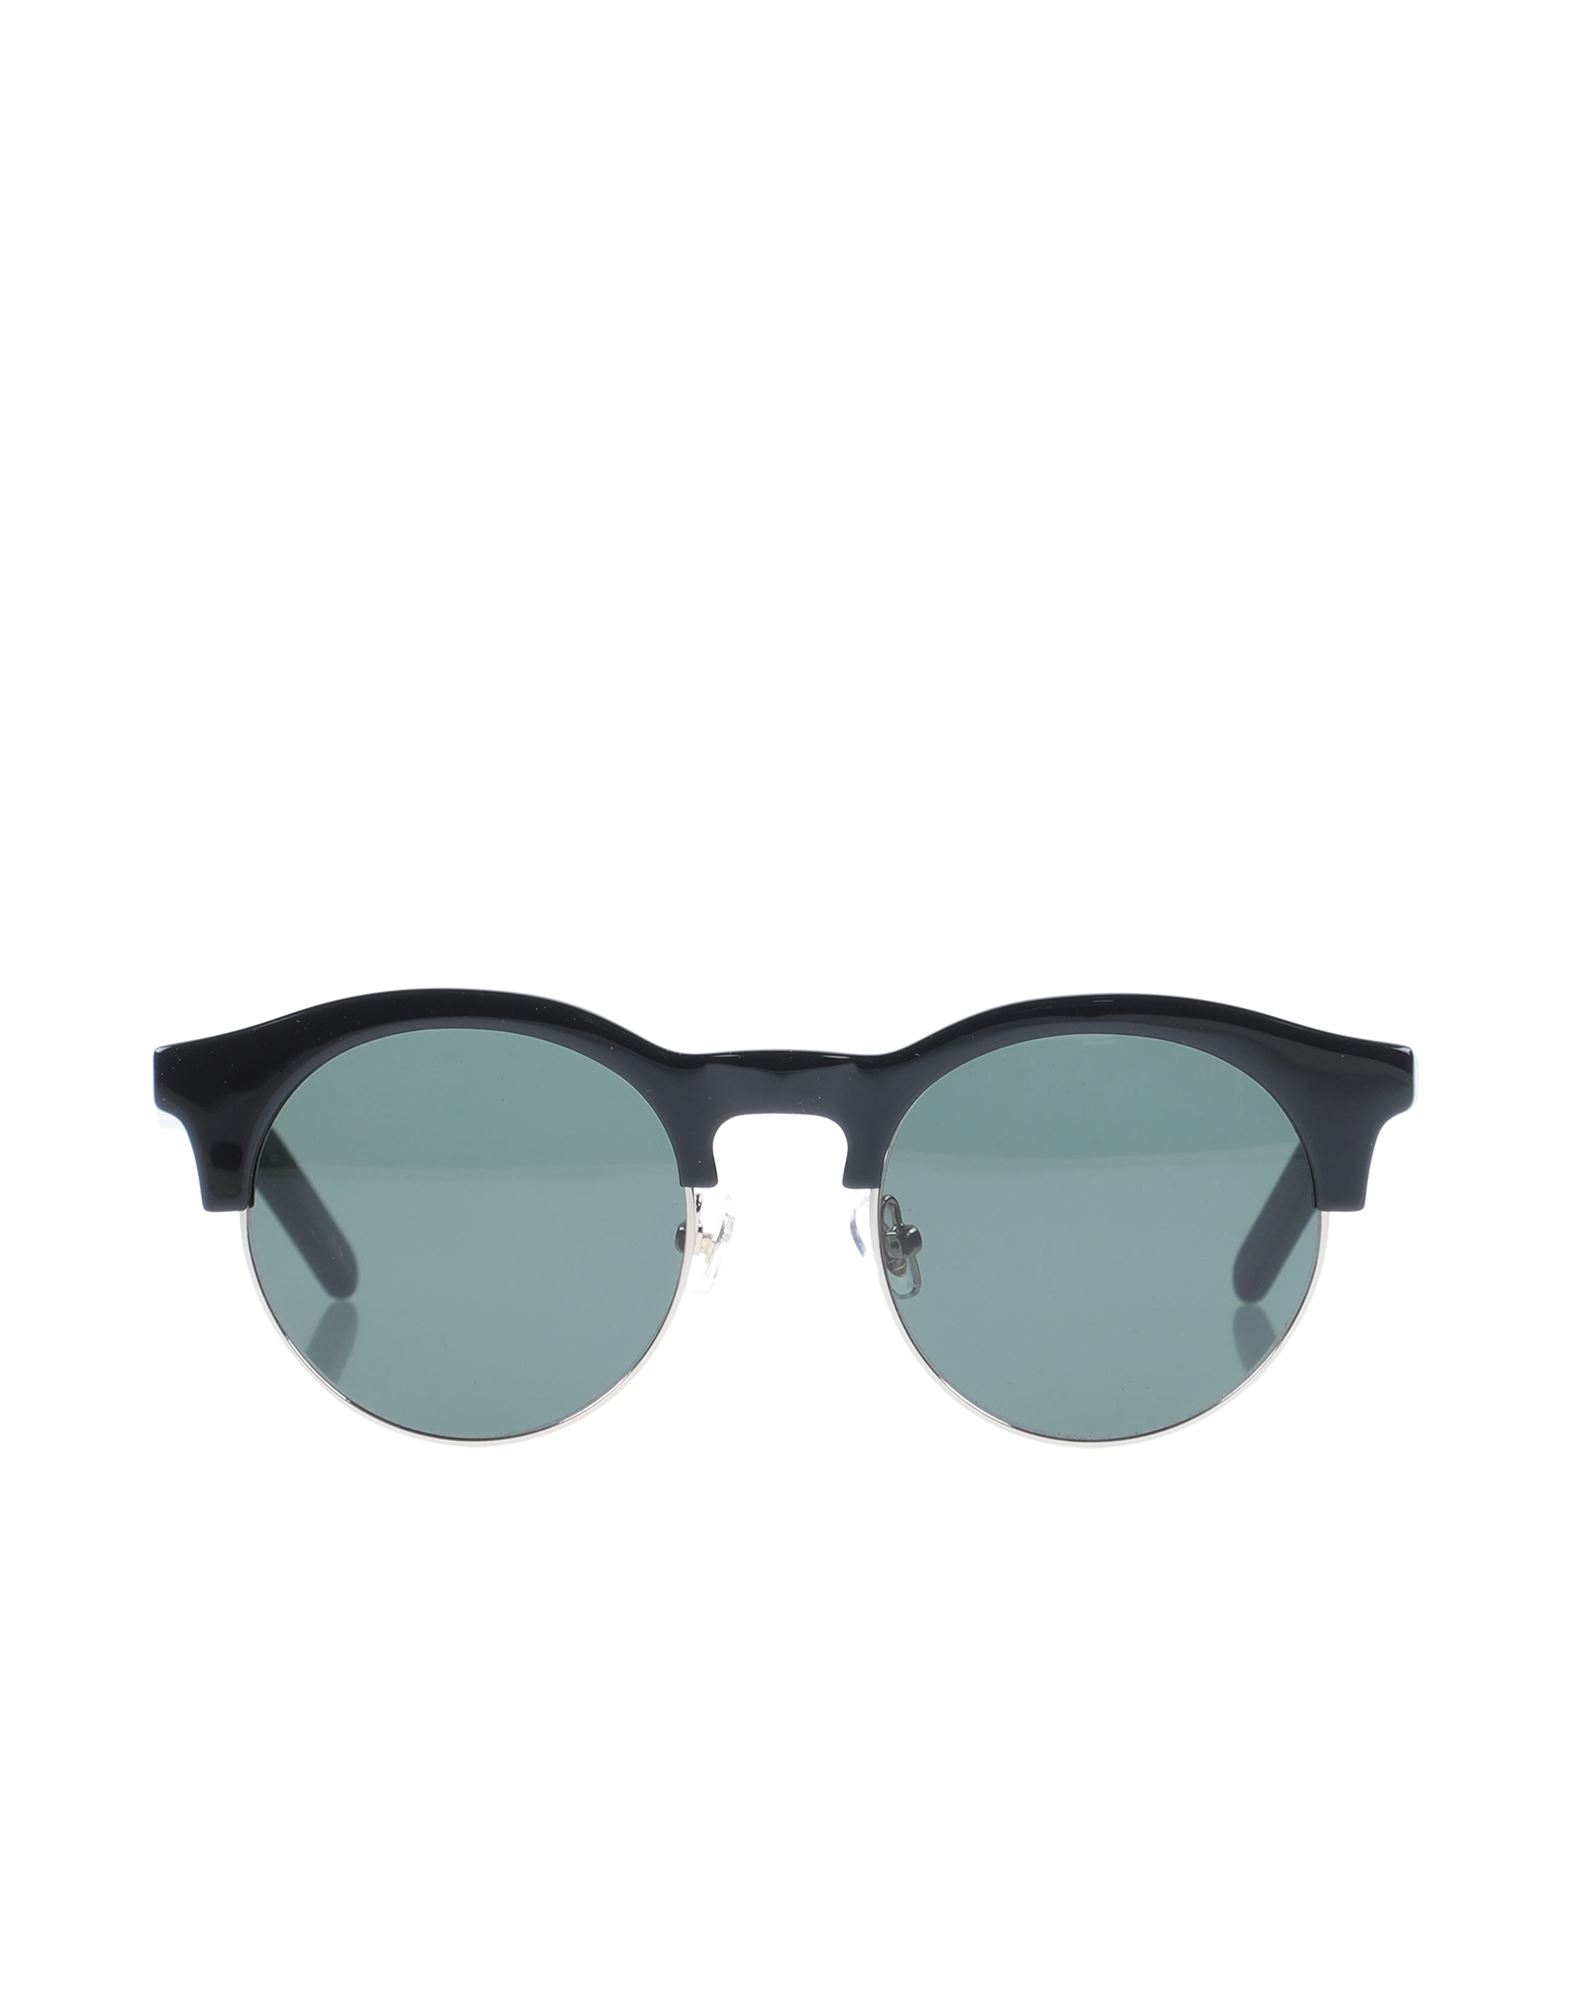 HAN KJØBENHAVN Sunglasses - Item 46745063